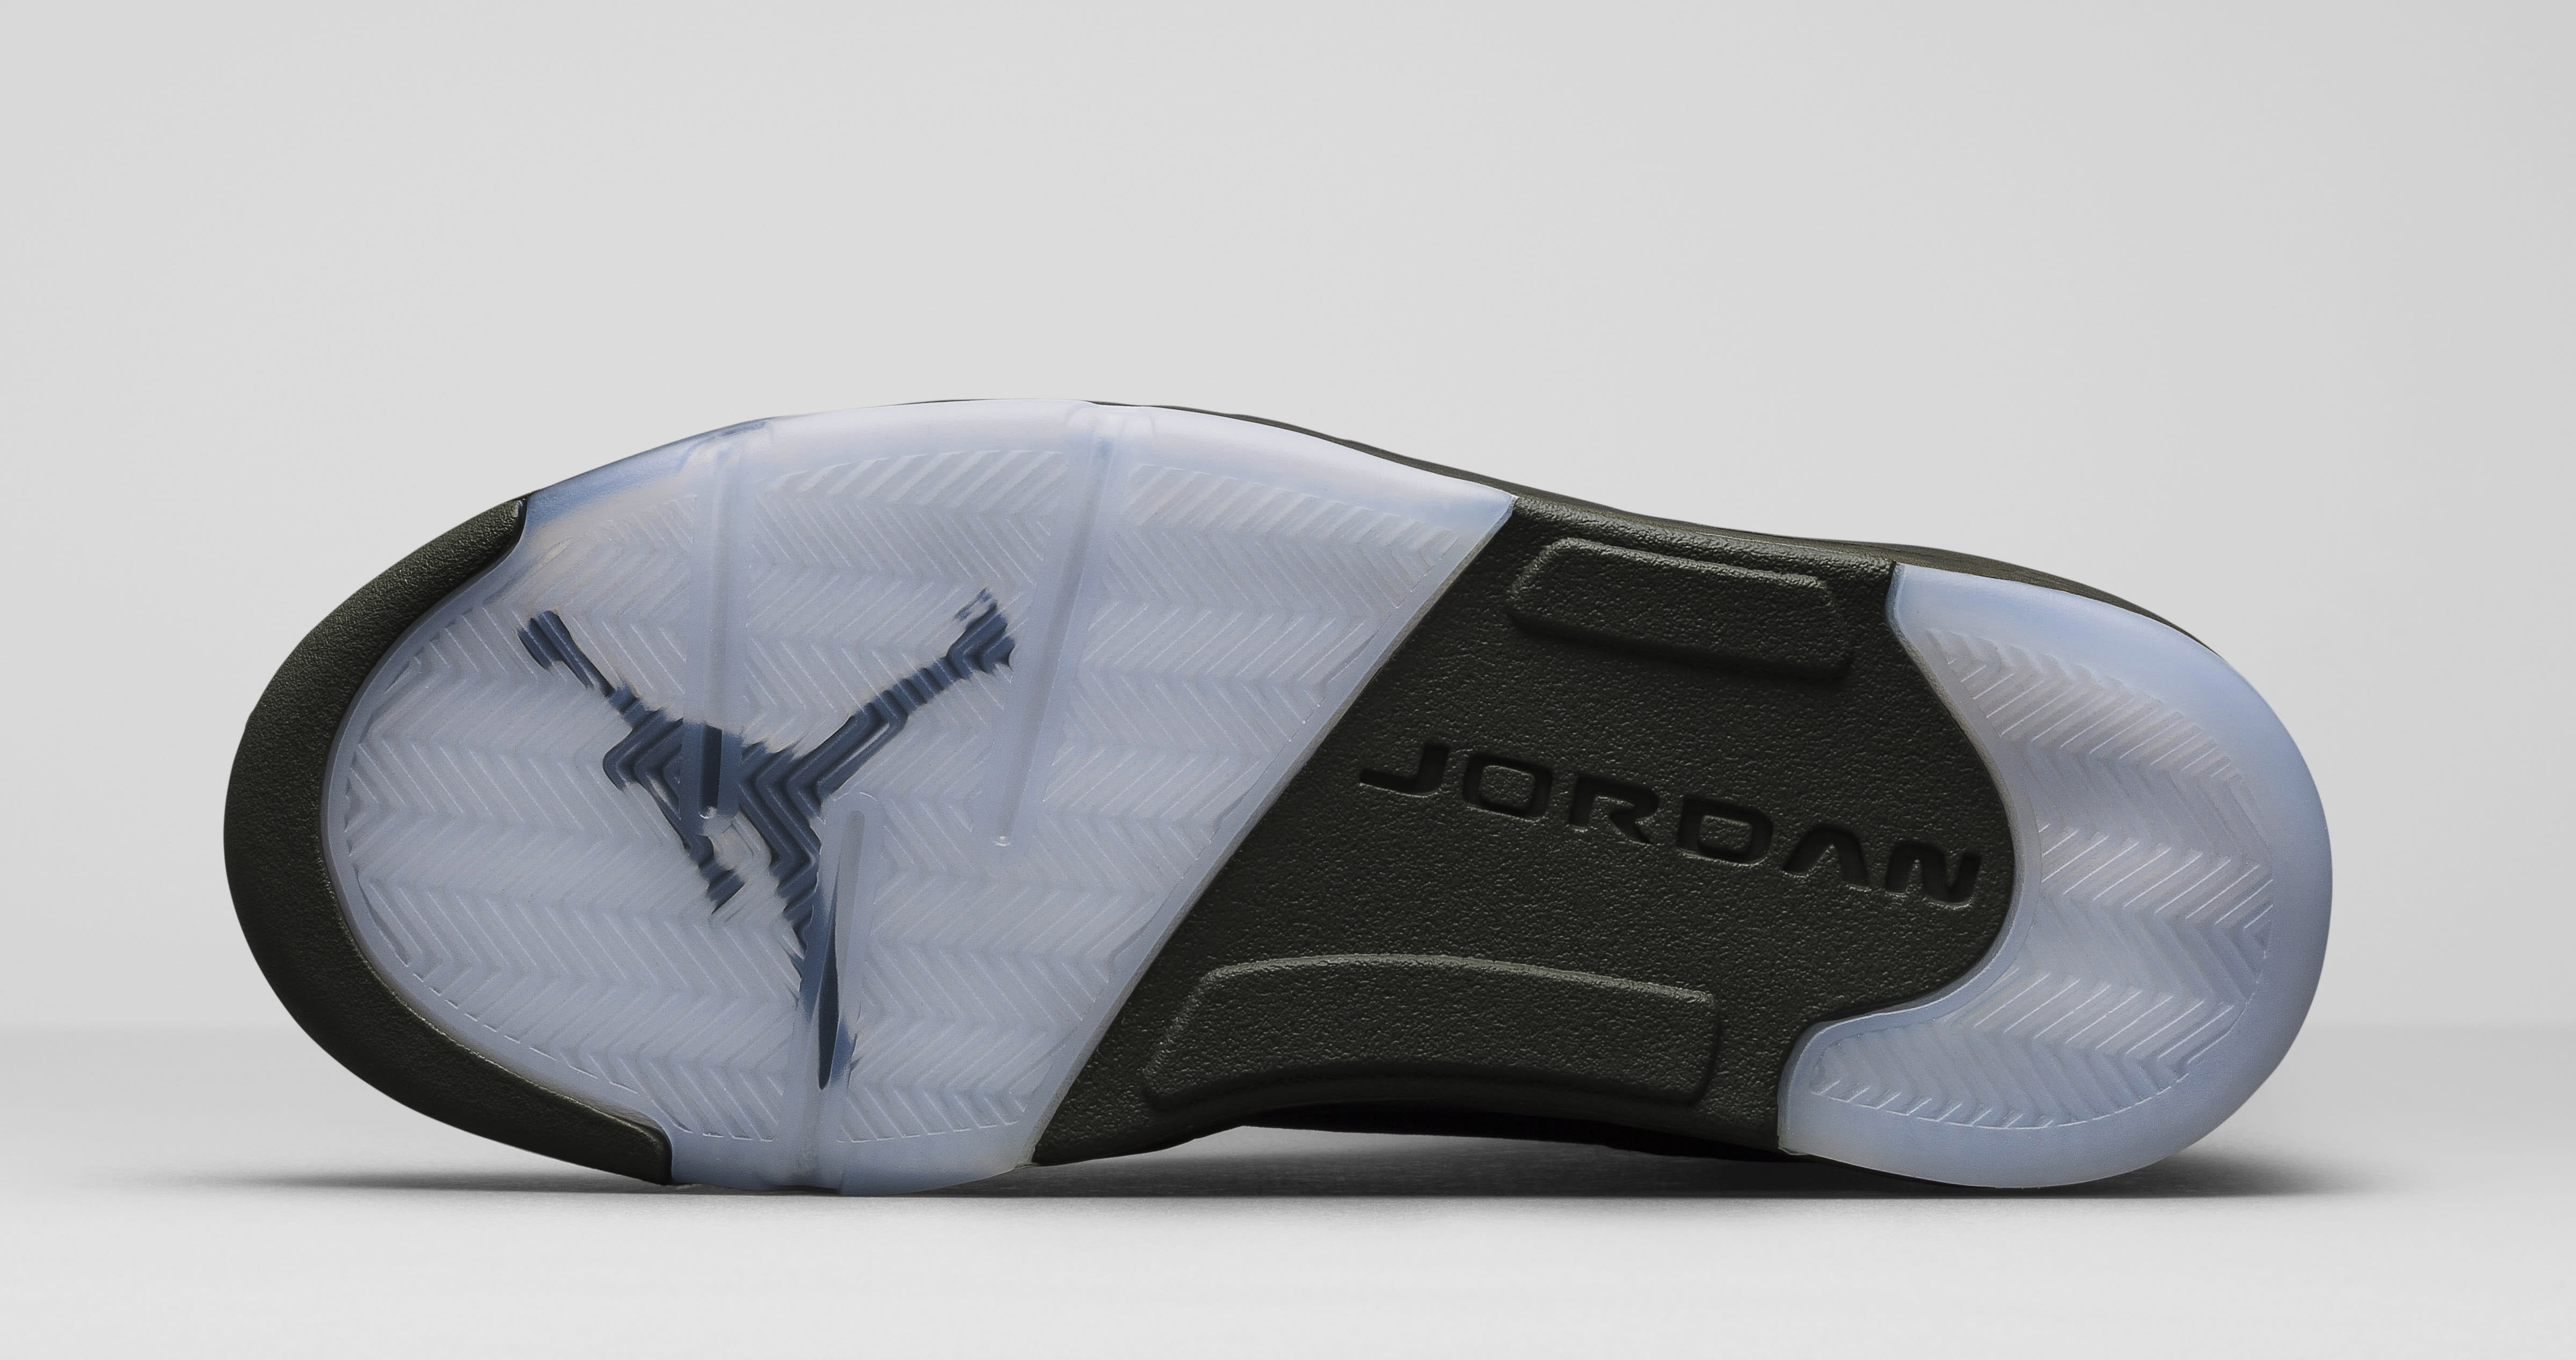 Take Flight Air Jordan 5 881432-305 Sole